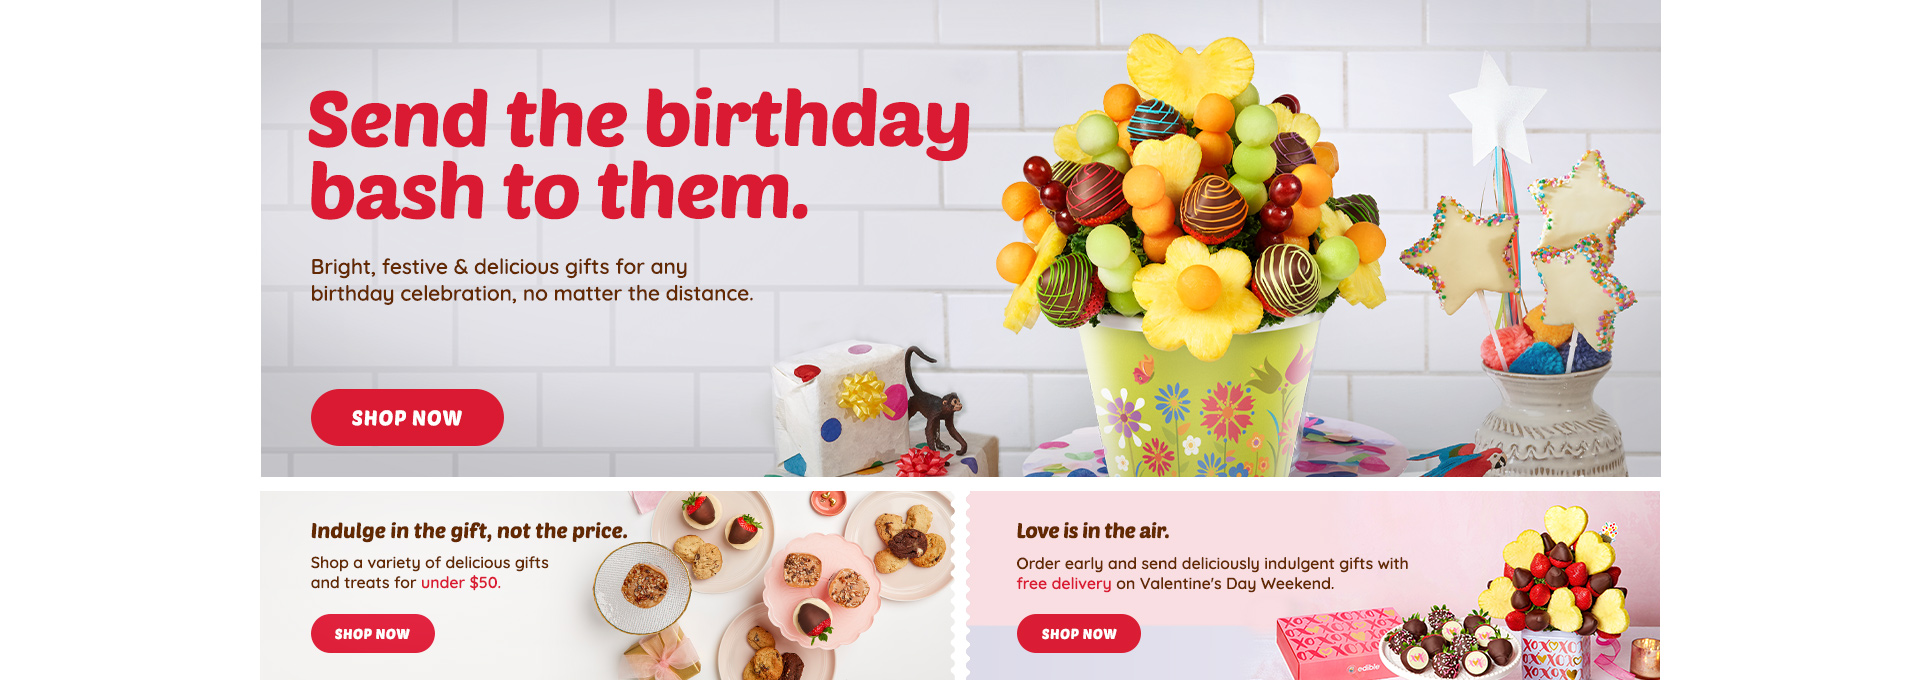 Desktop Birthday